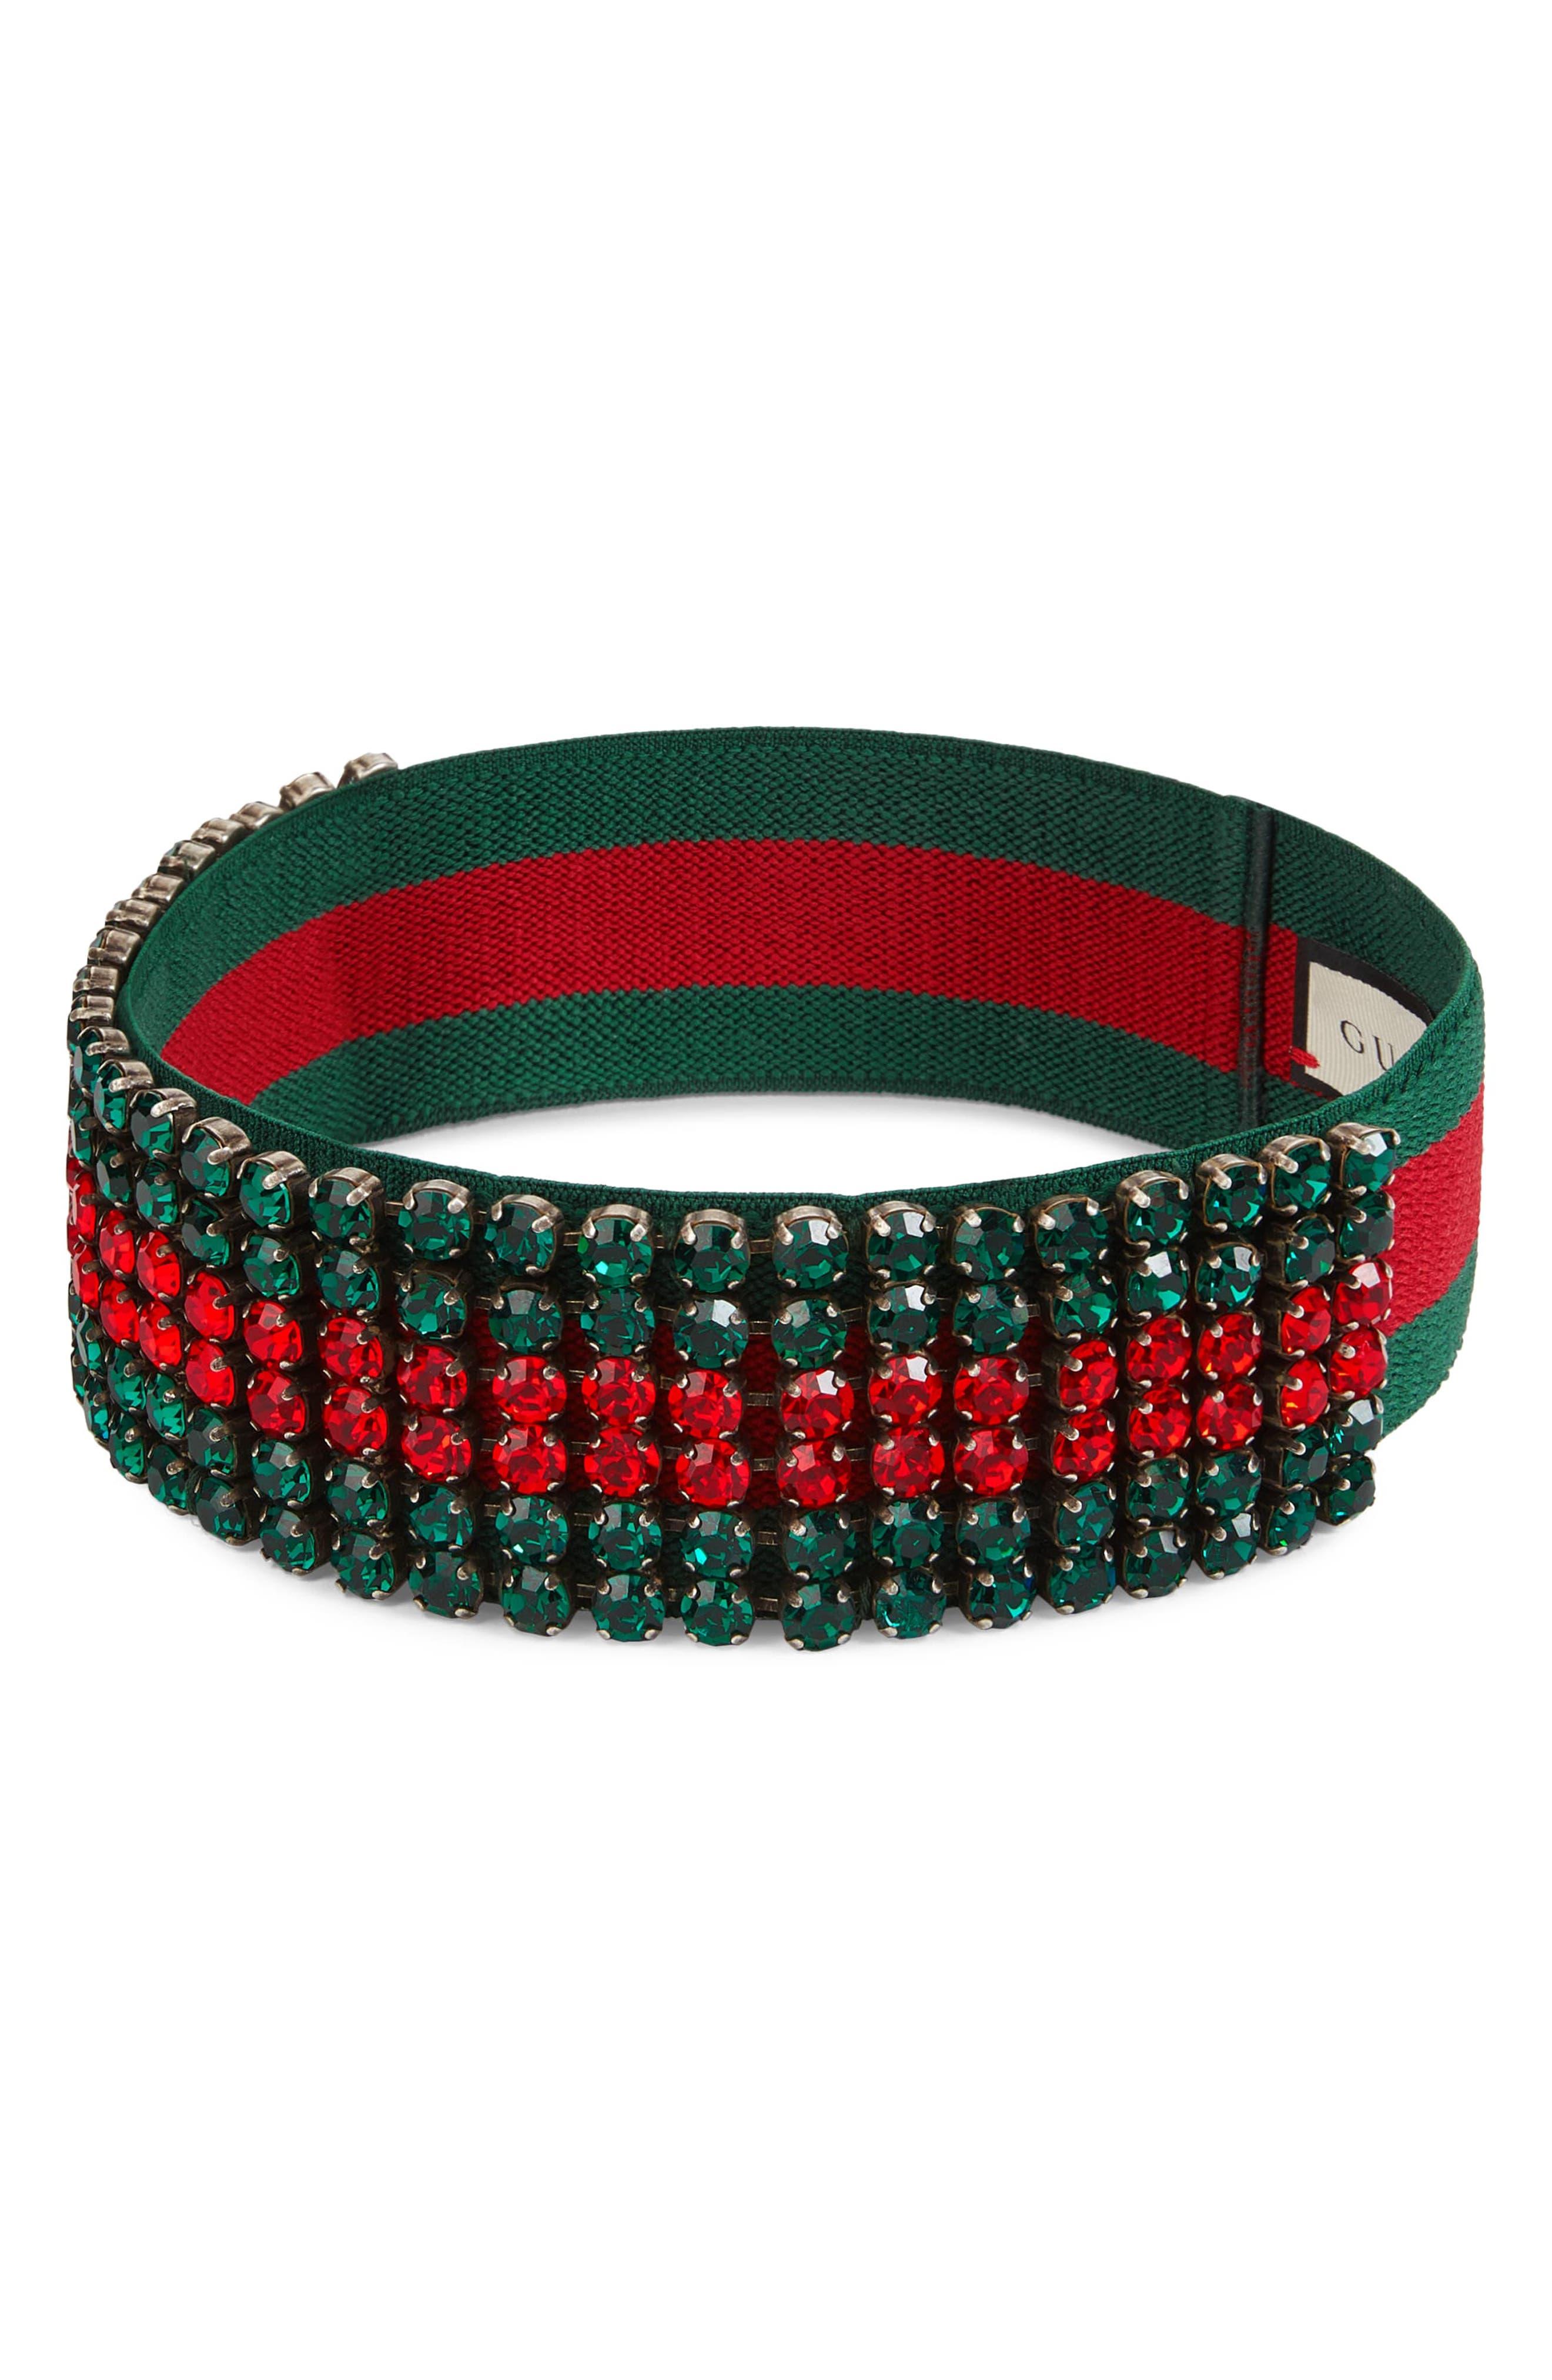 Webby Crystal Headband,                             Main thumbnail 1, color,                             RED/ DARK GREEN